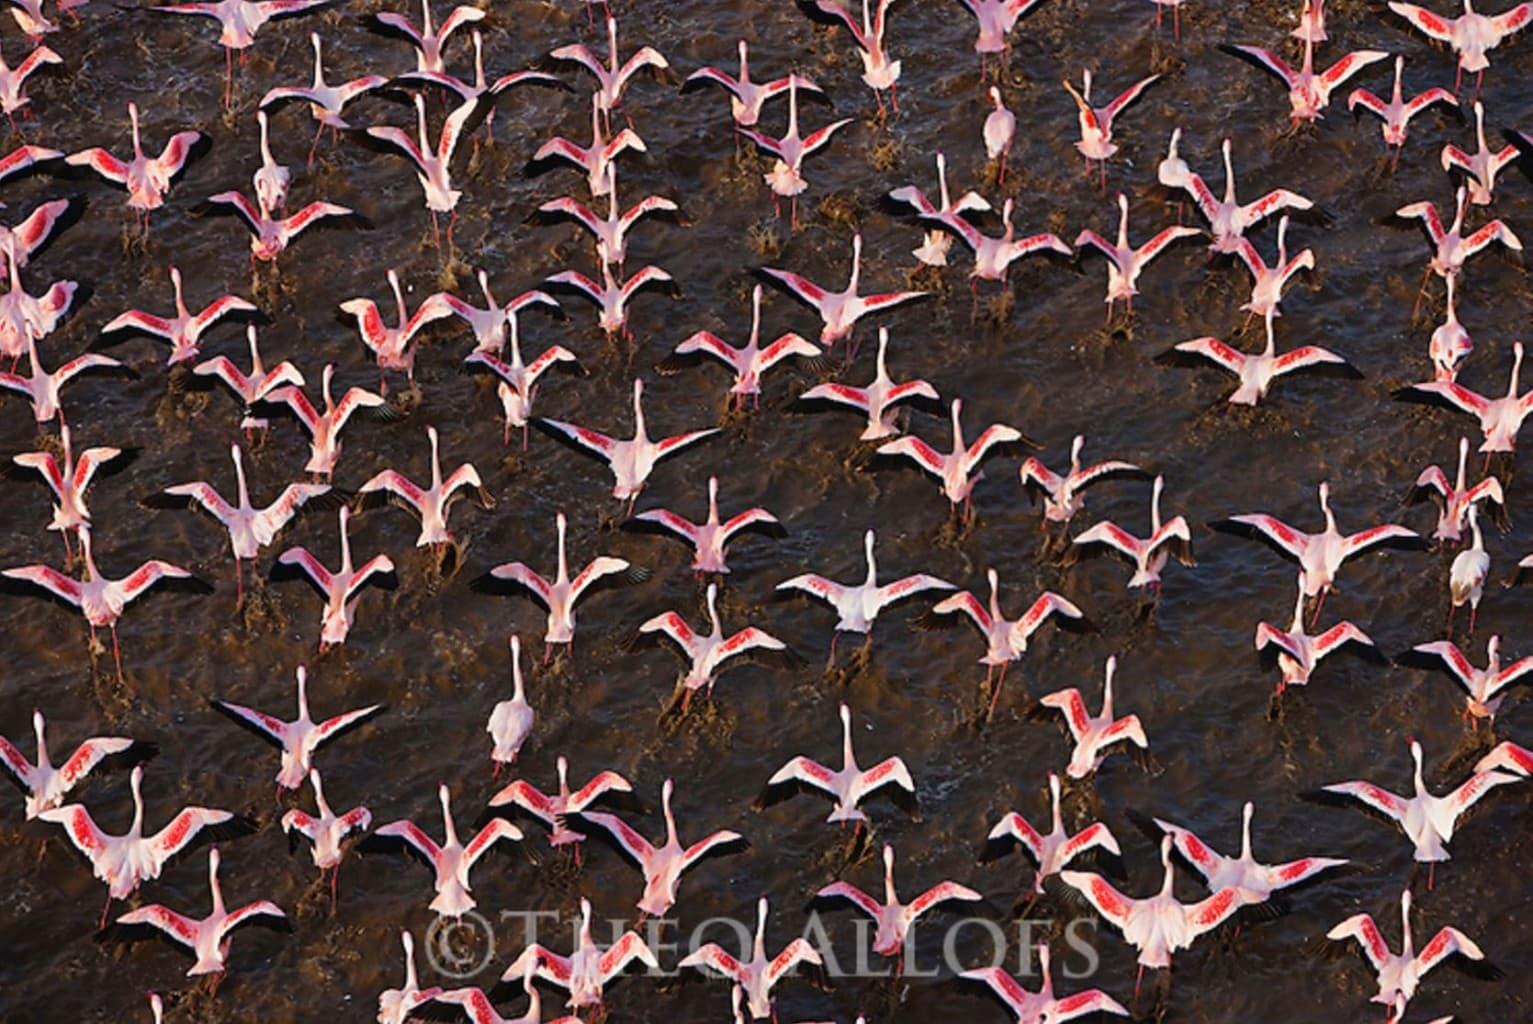 Image: Flamingos taking flight over a lake